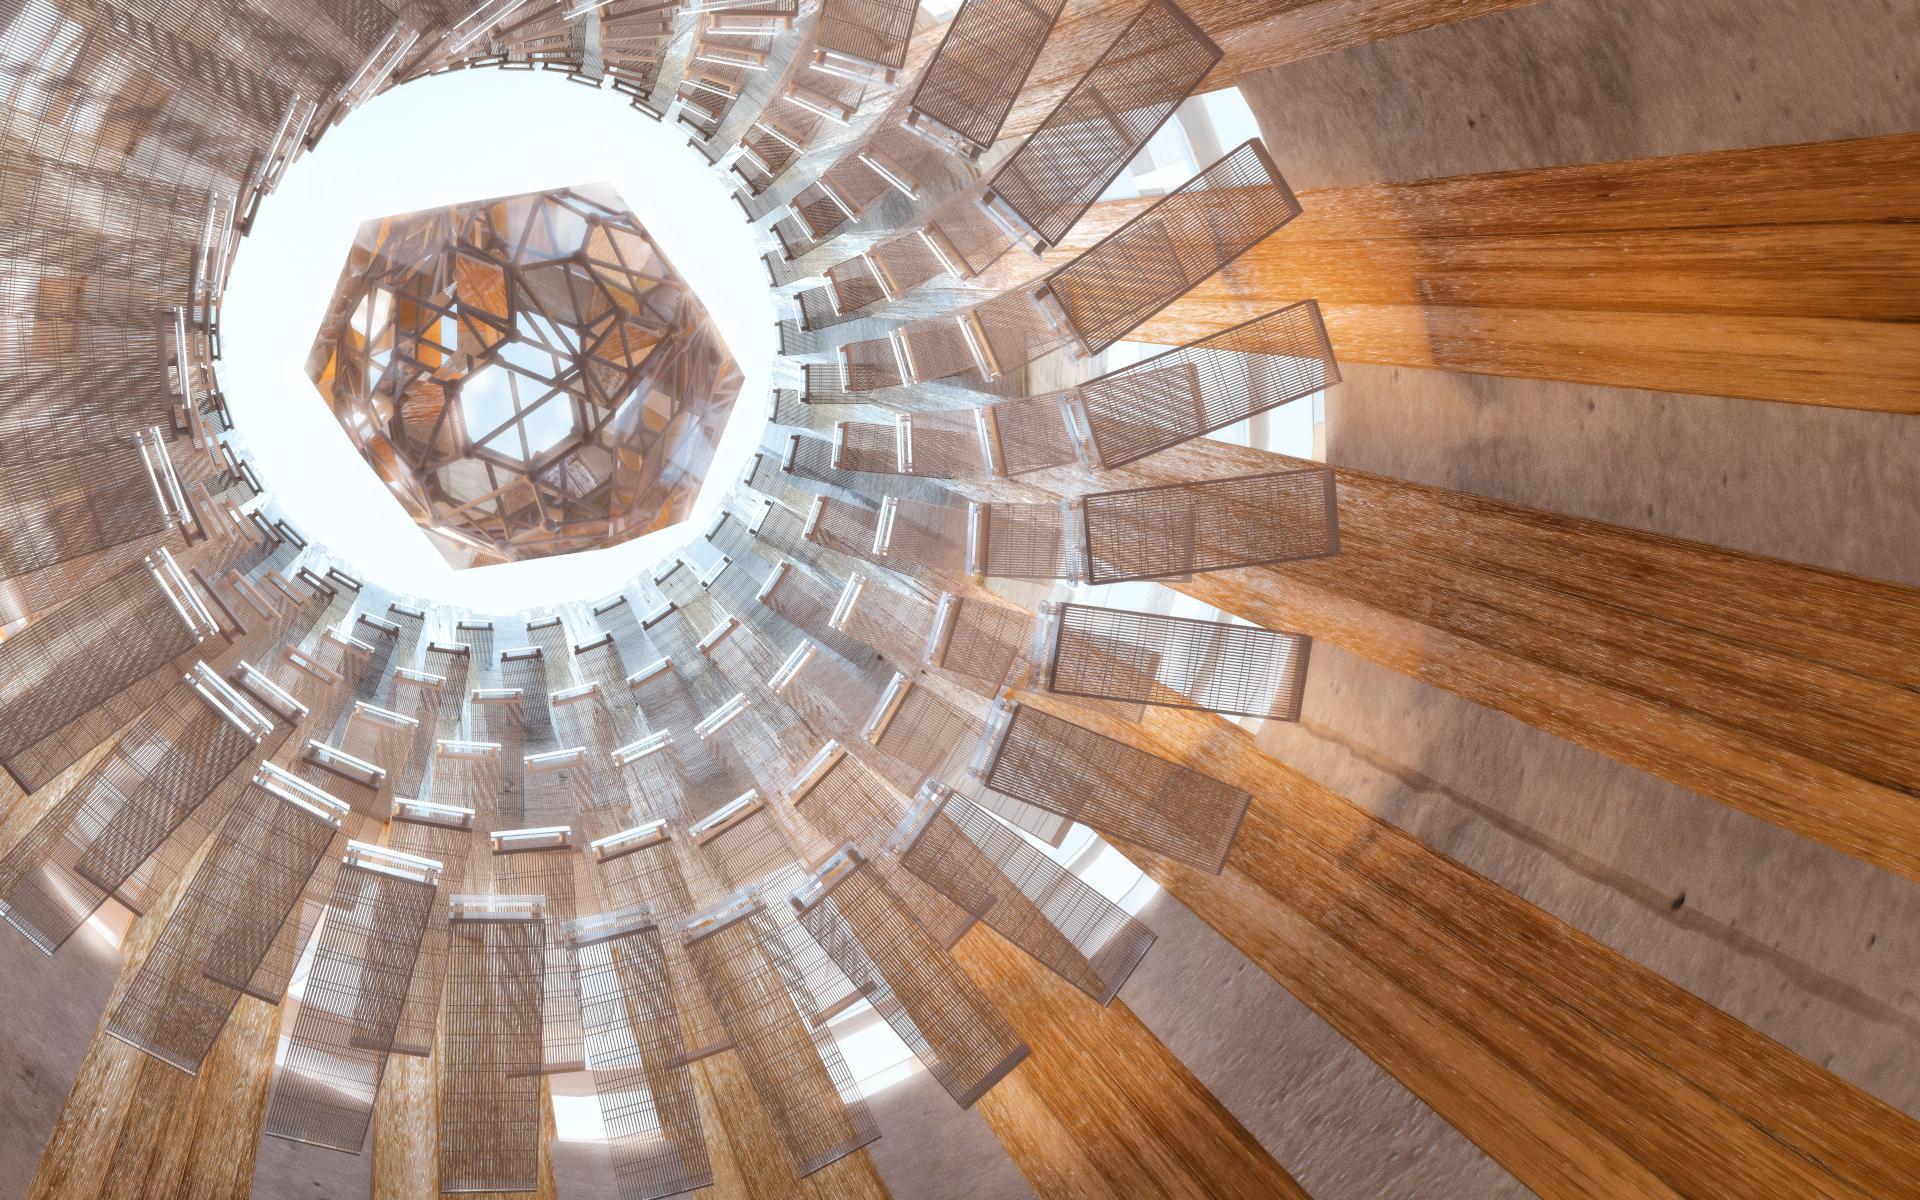 kentic staircase